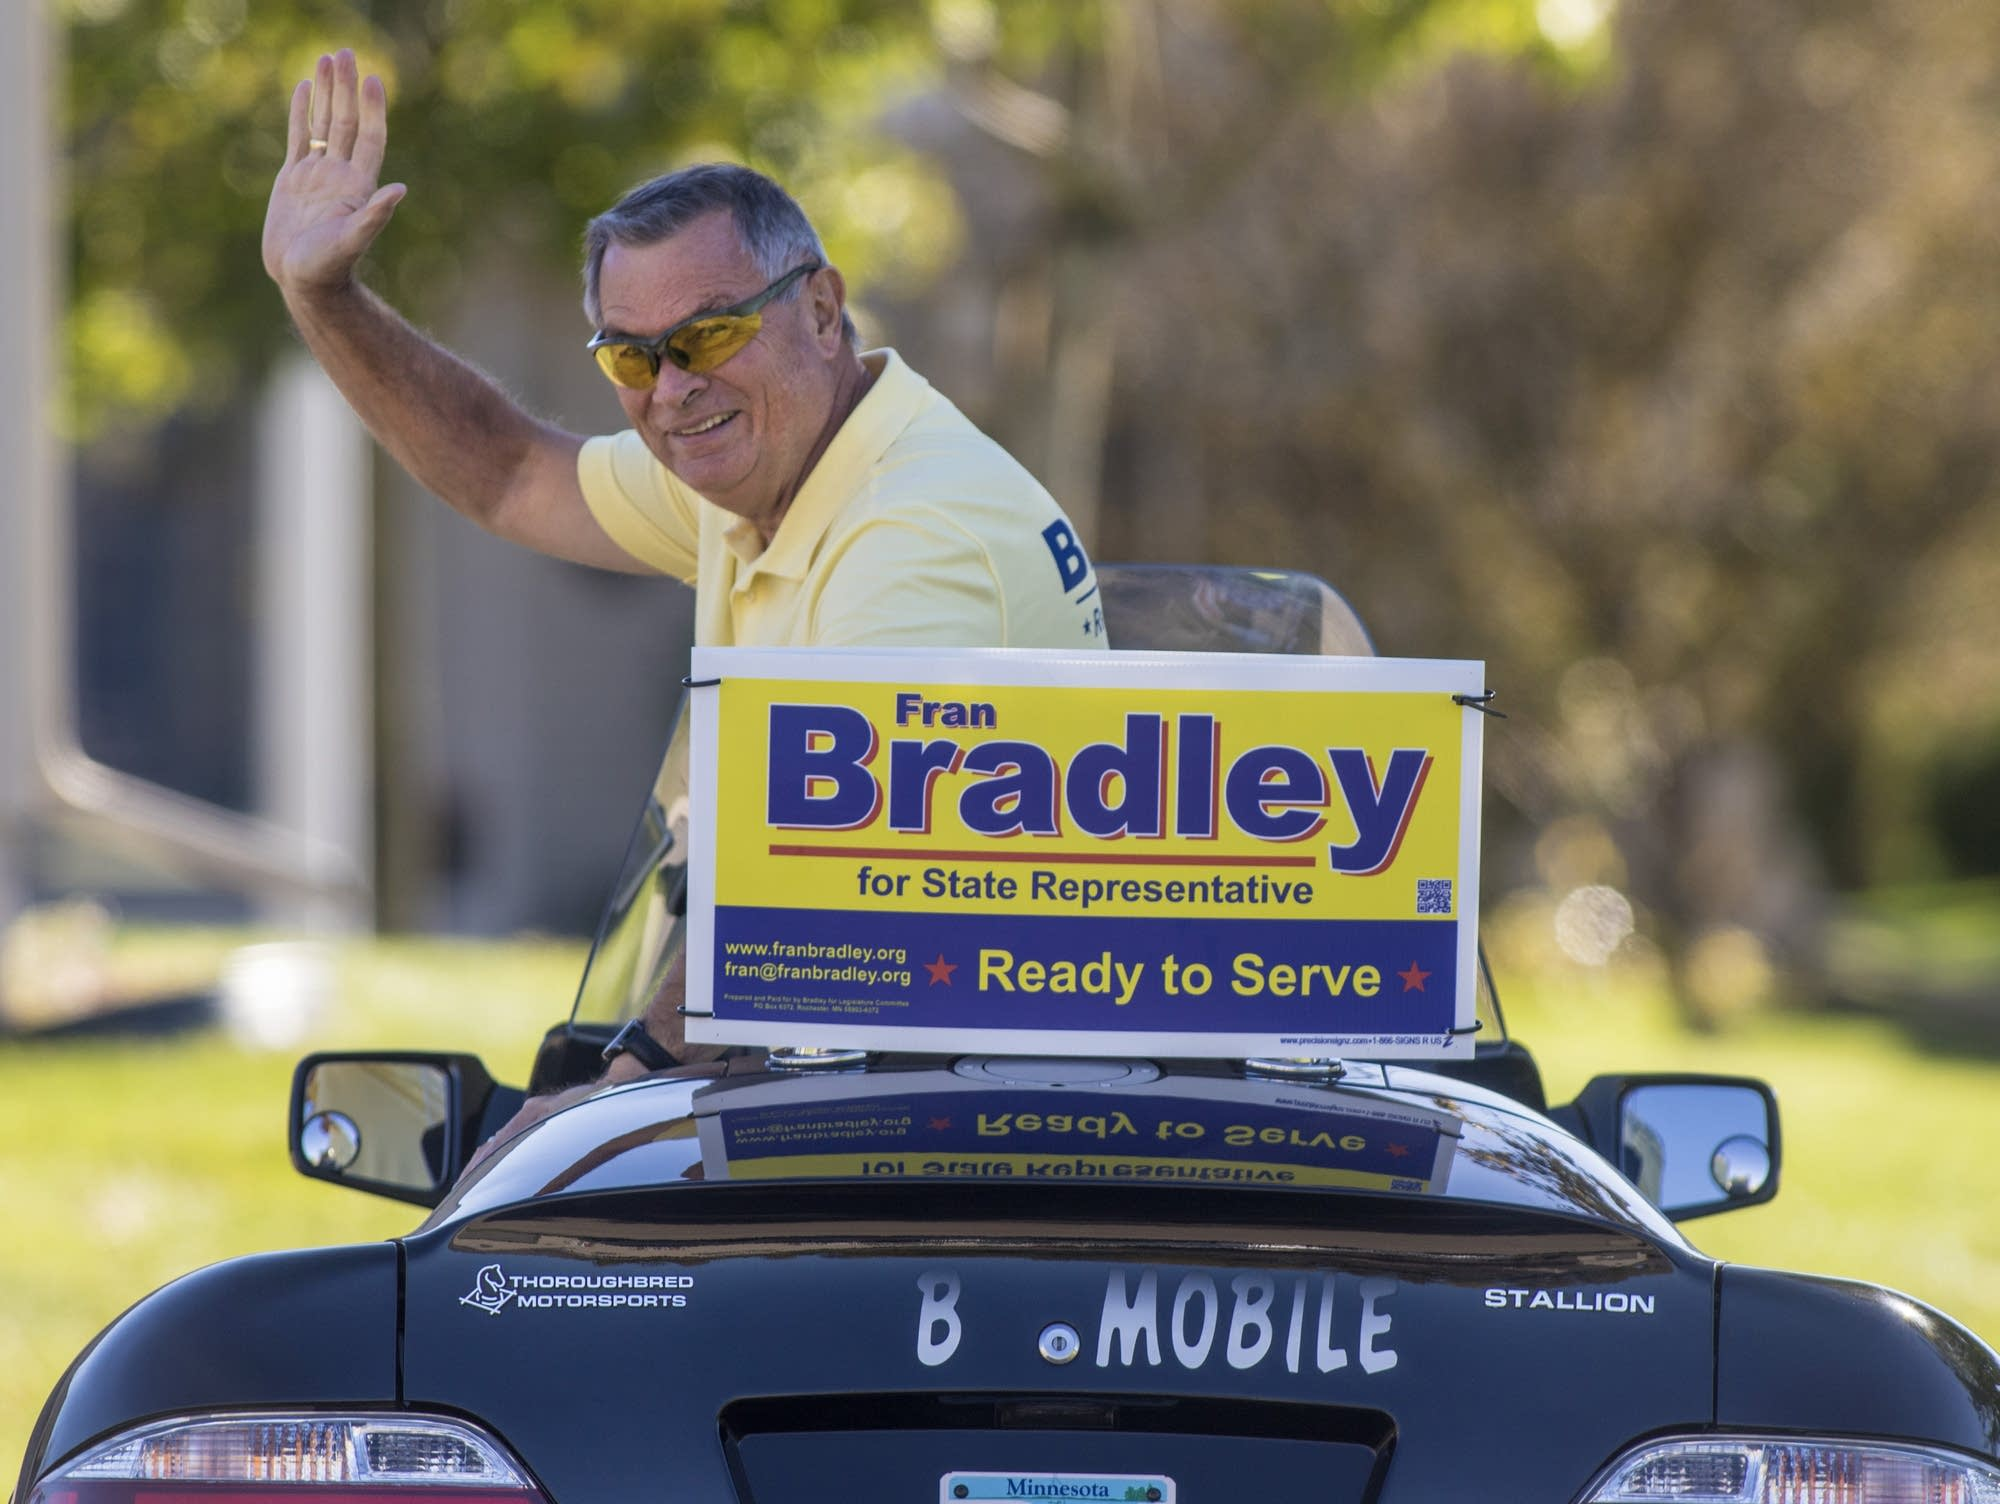 Candidate Fran Bradley